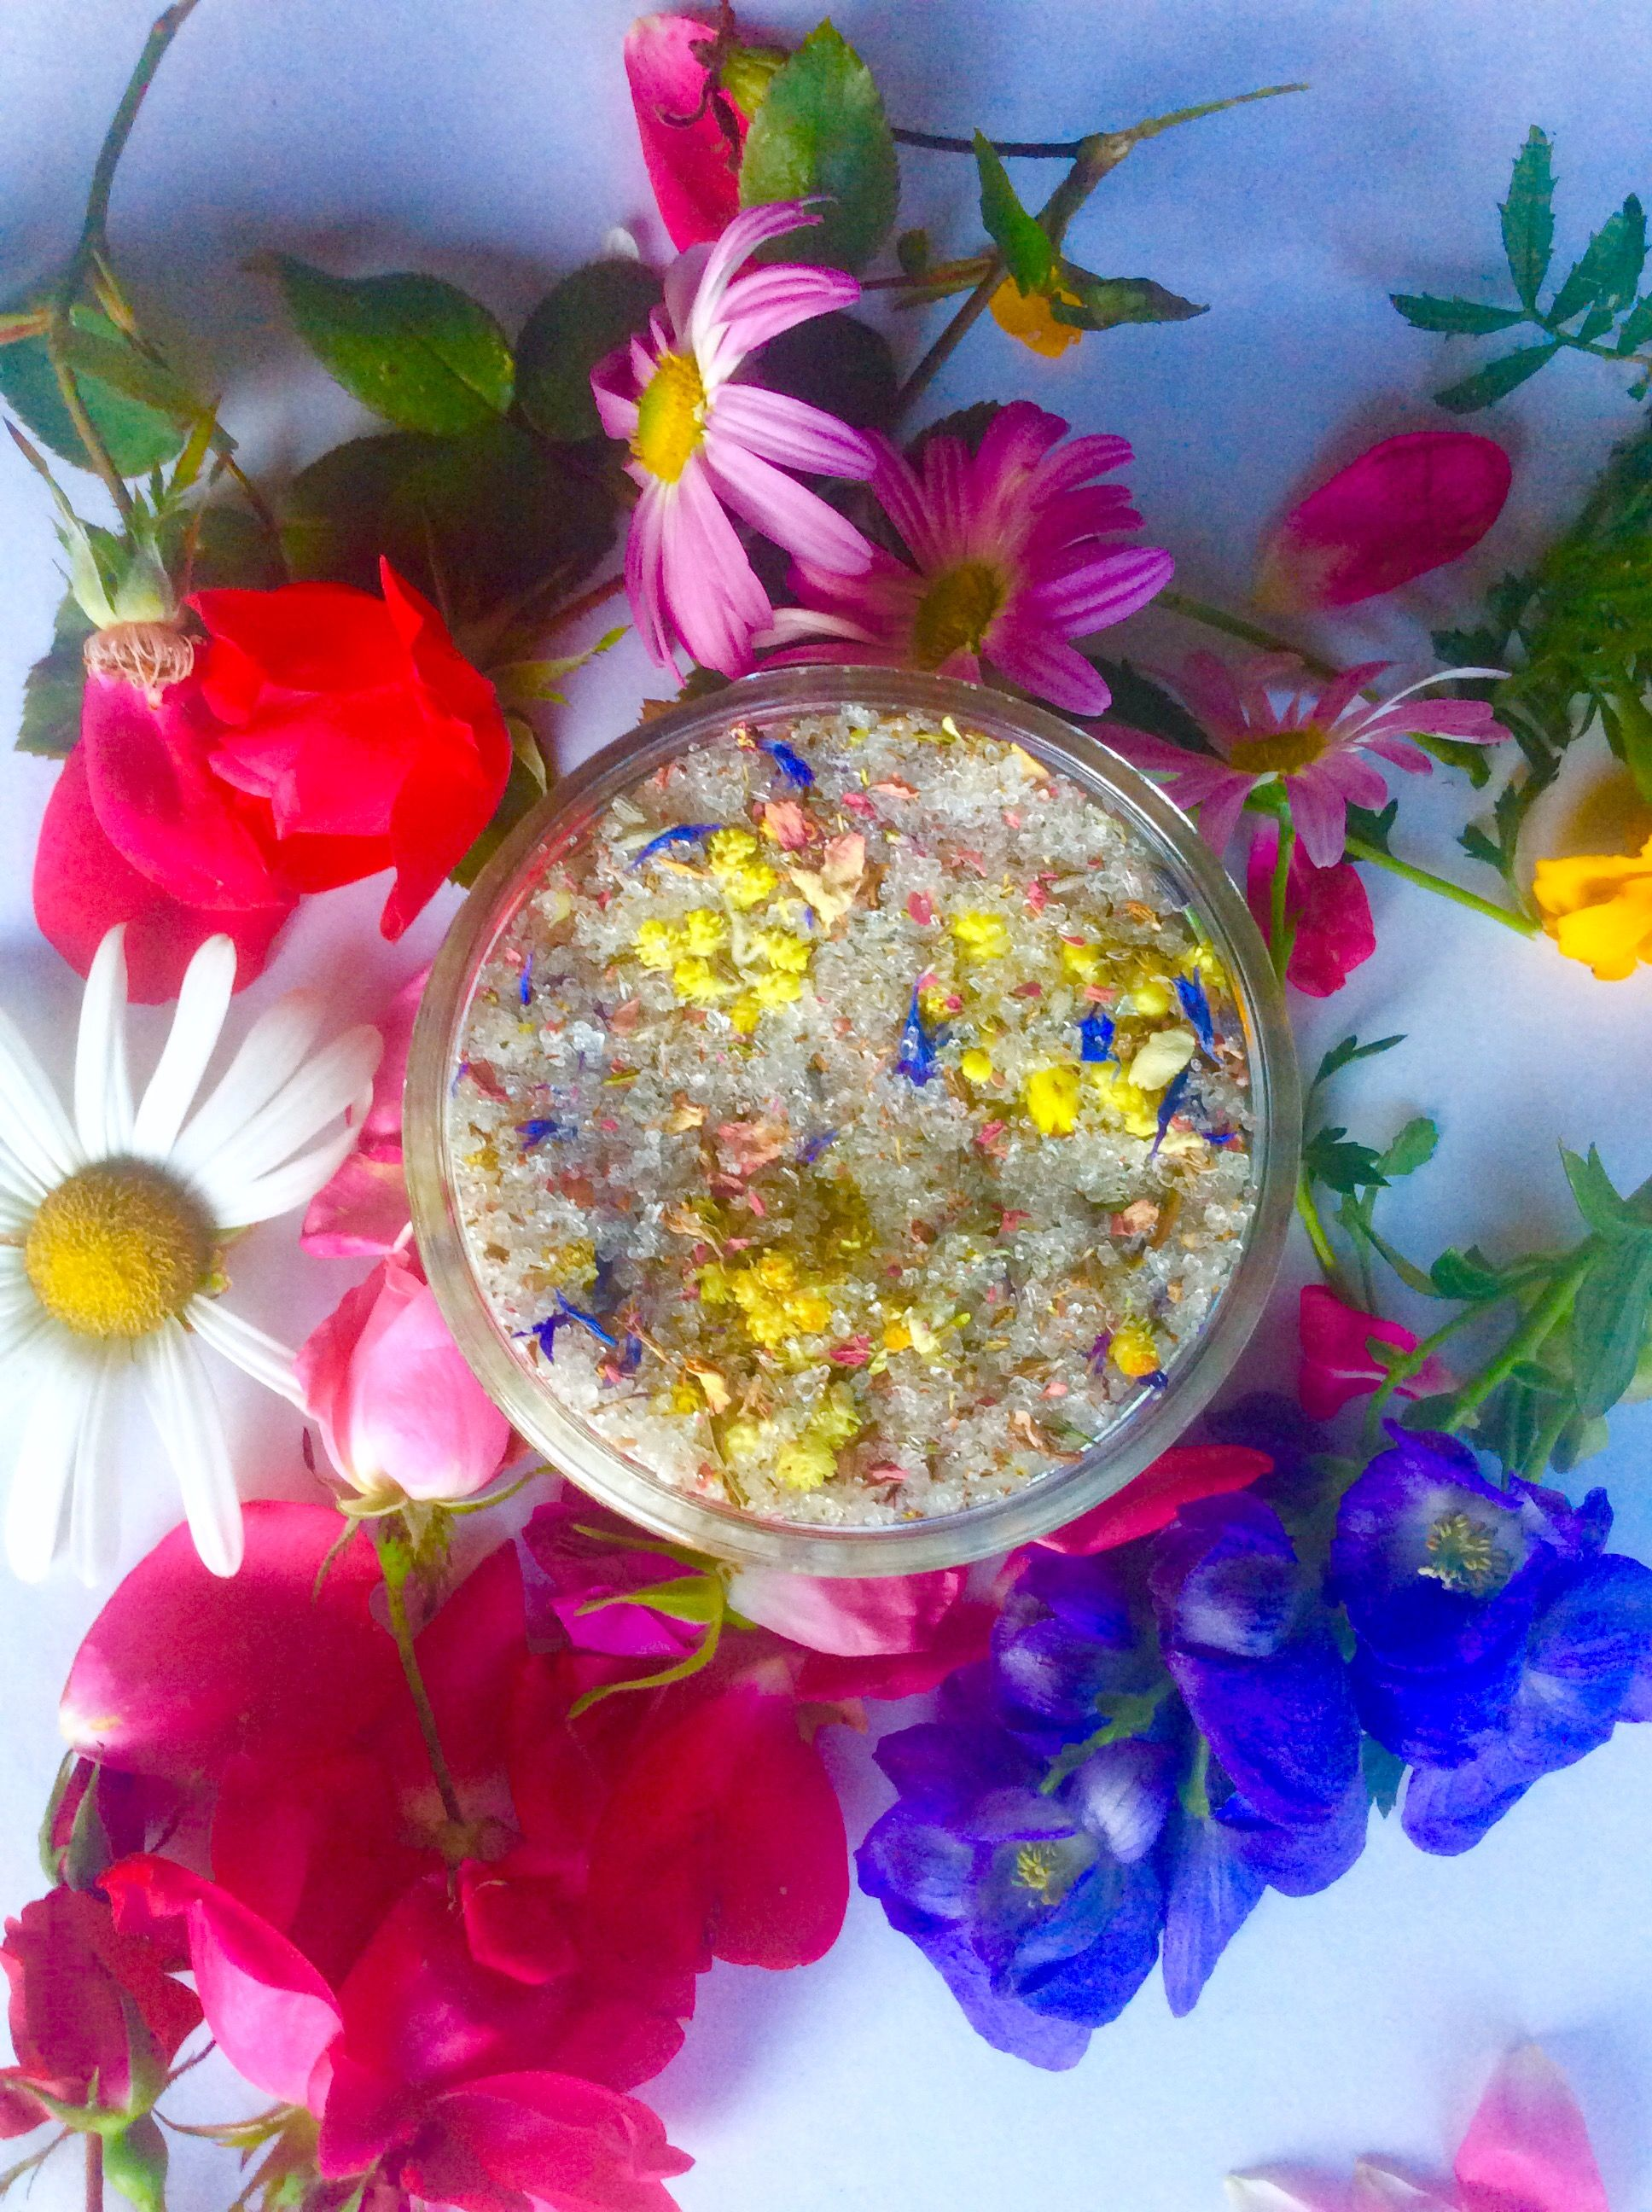 Rainbow Flower Bathing Salts 🌈🦄 xo, Plant Makeup Herbal bath